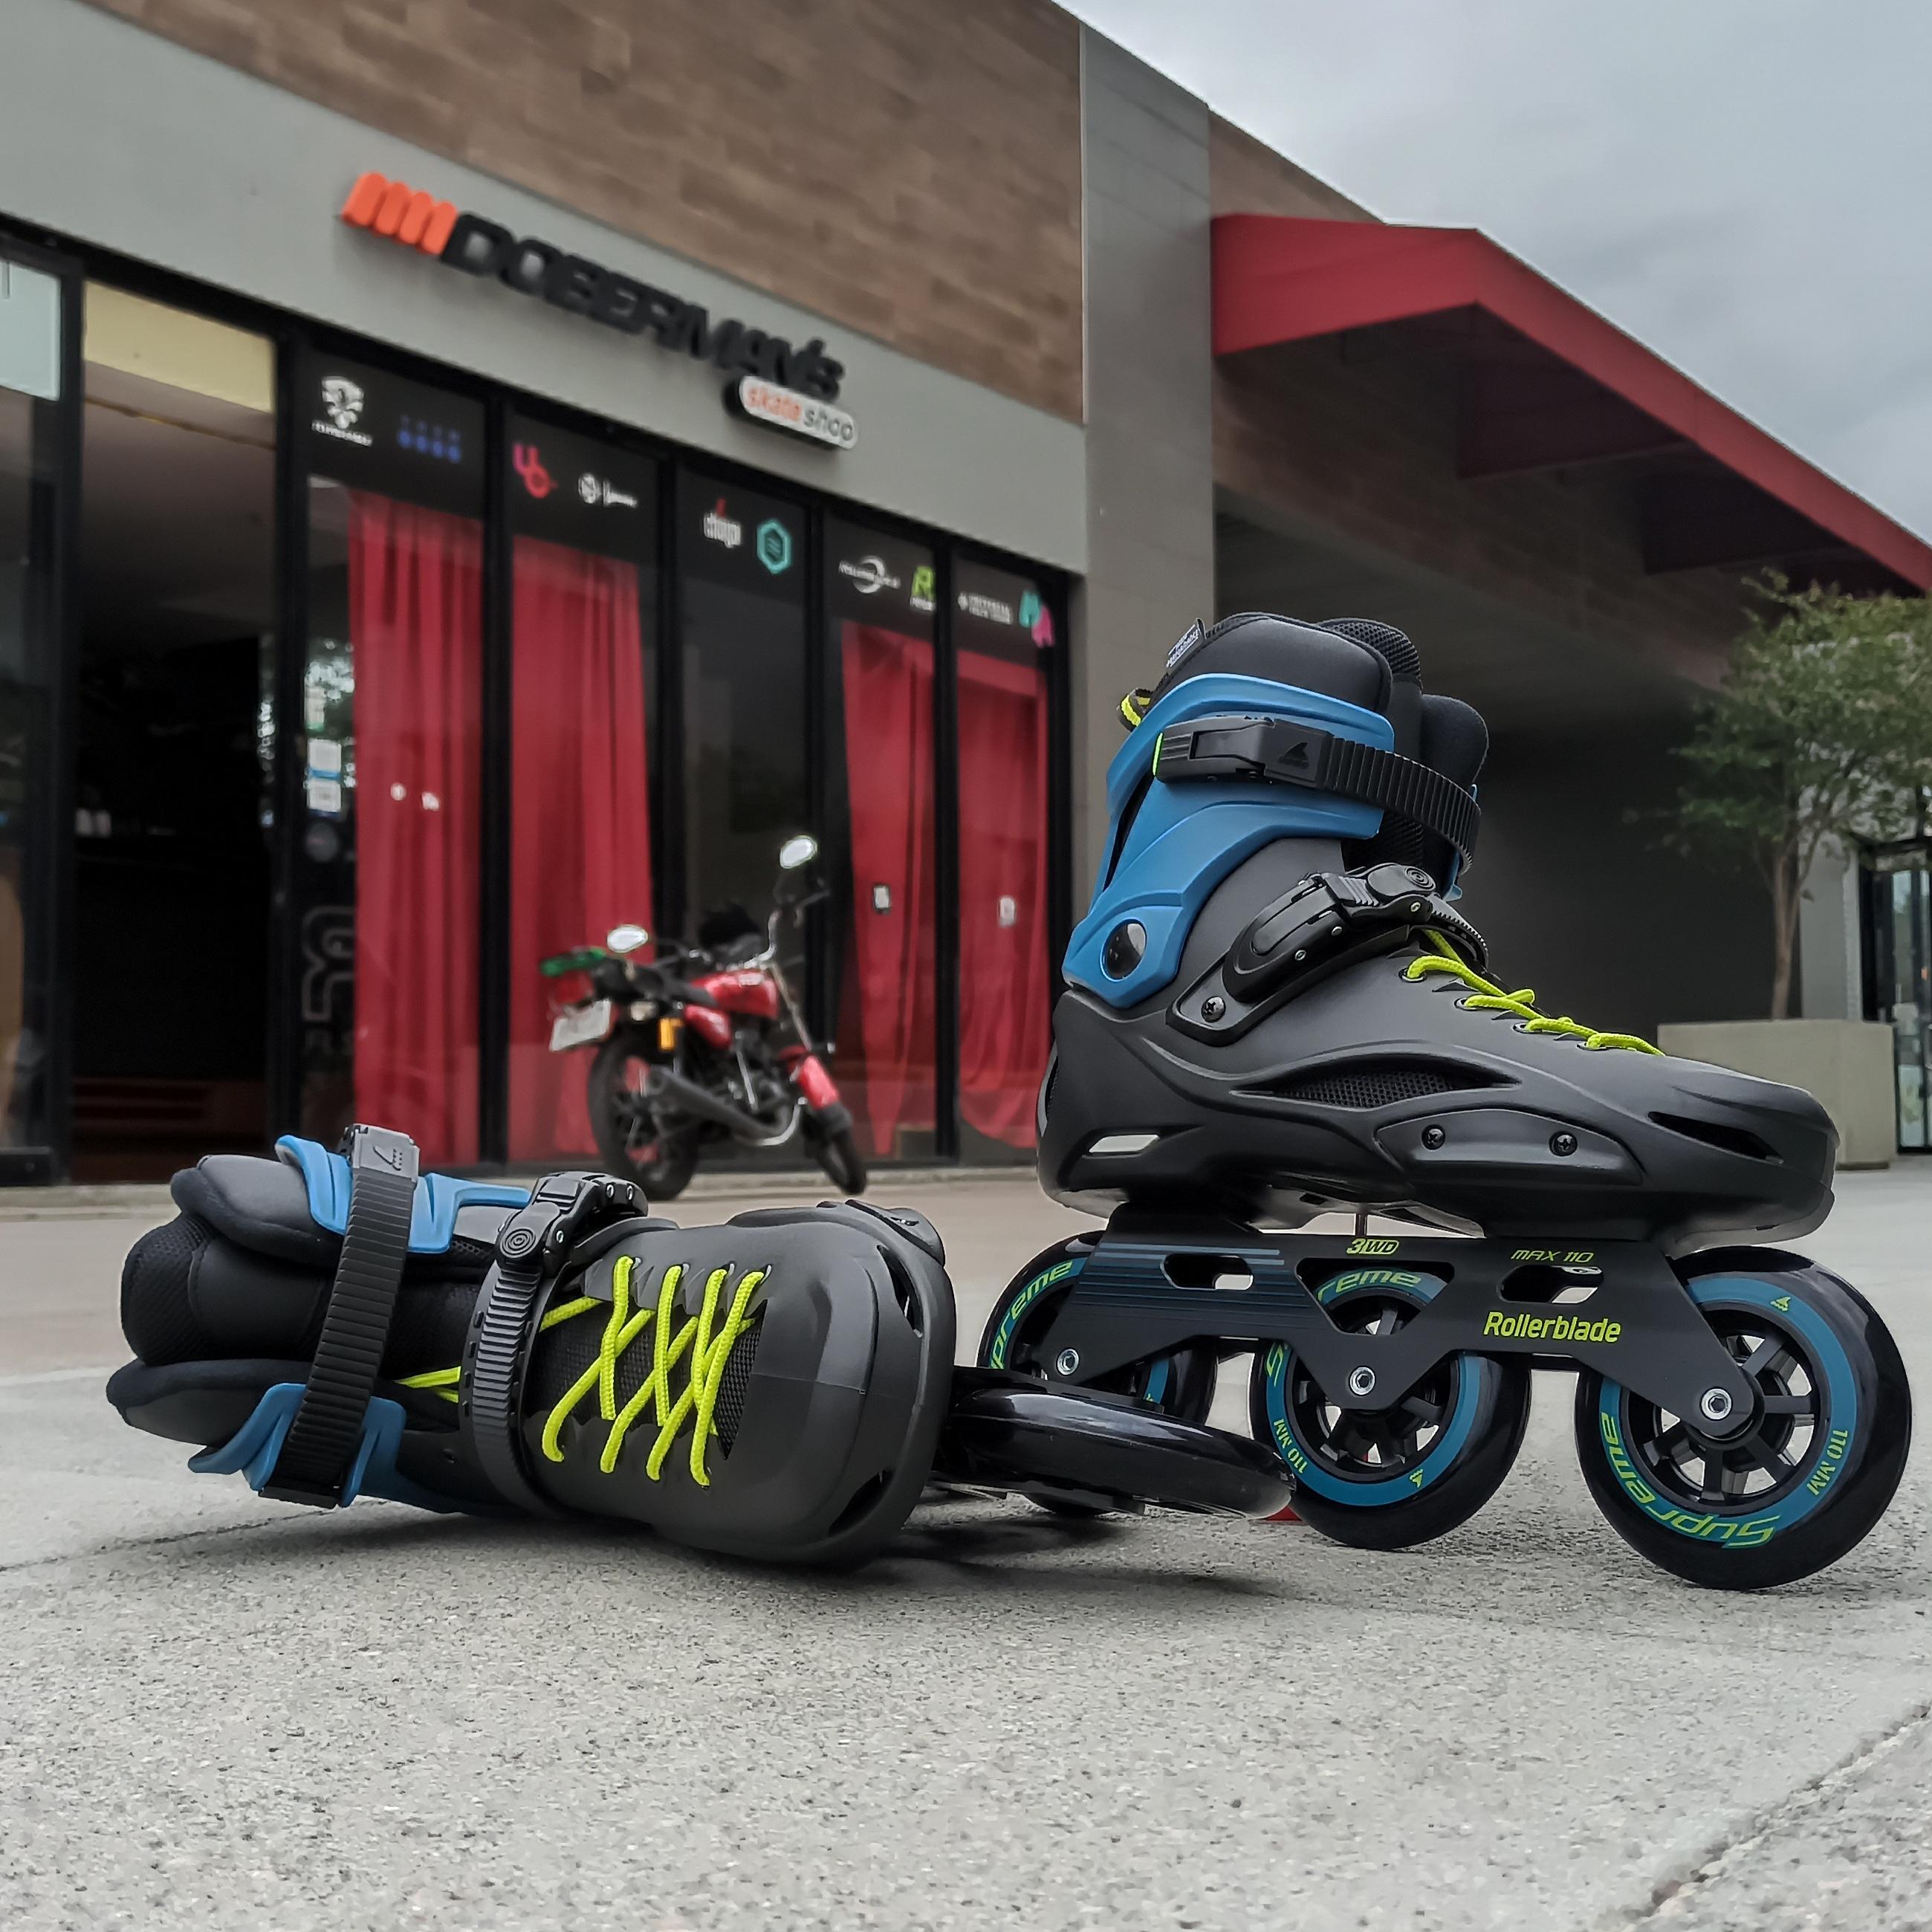 Doberman's Roller Skate Shop